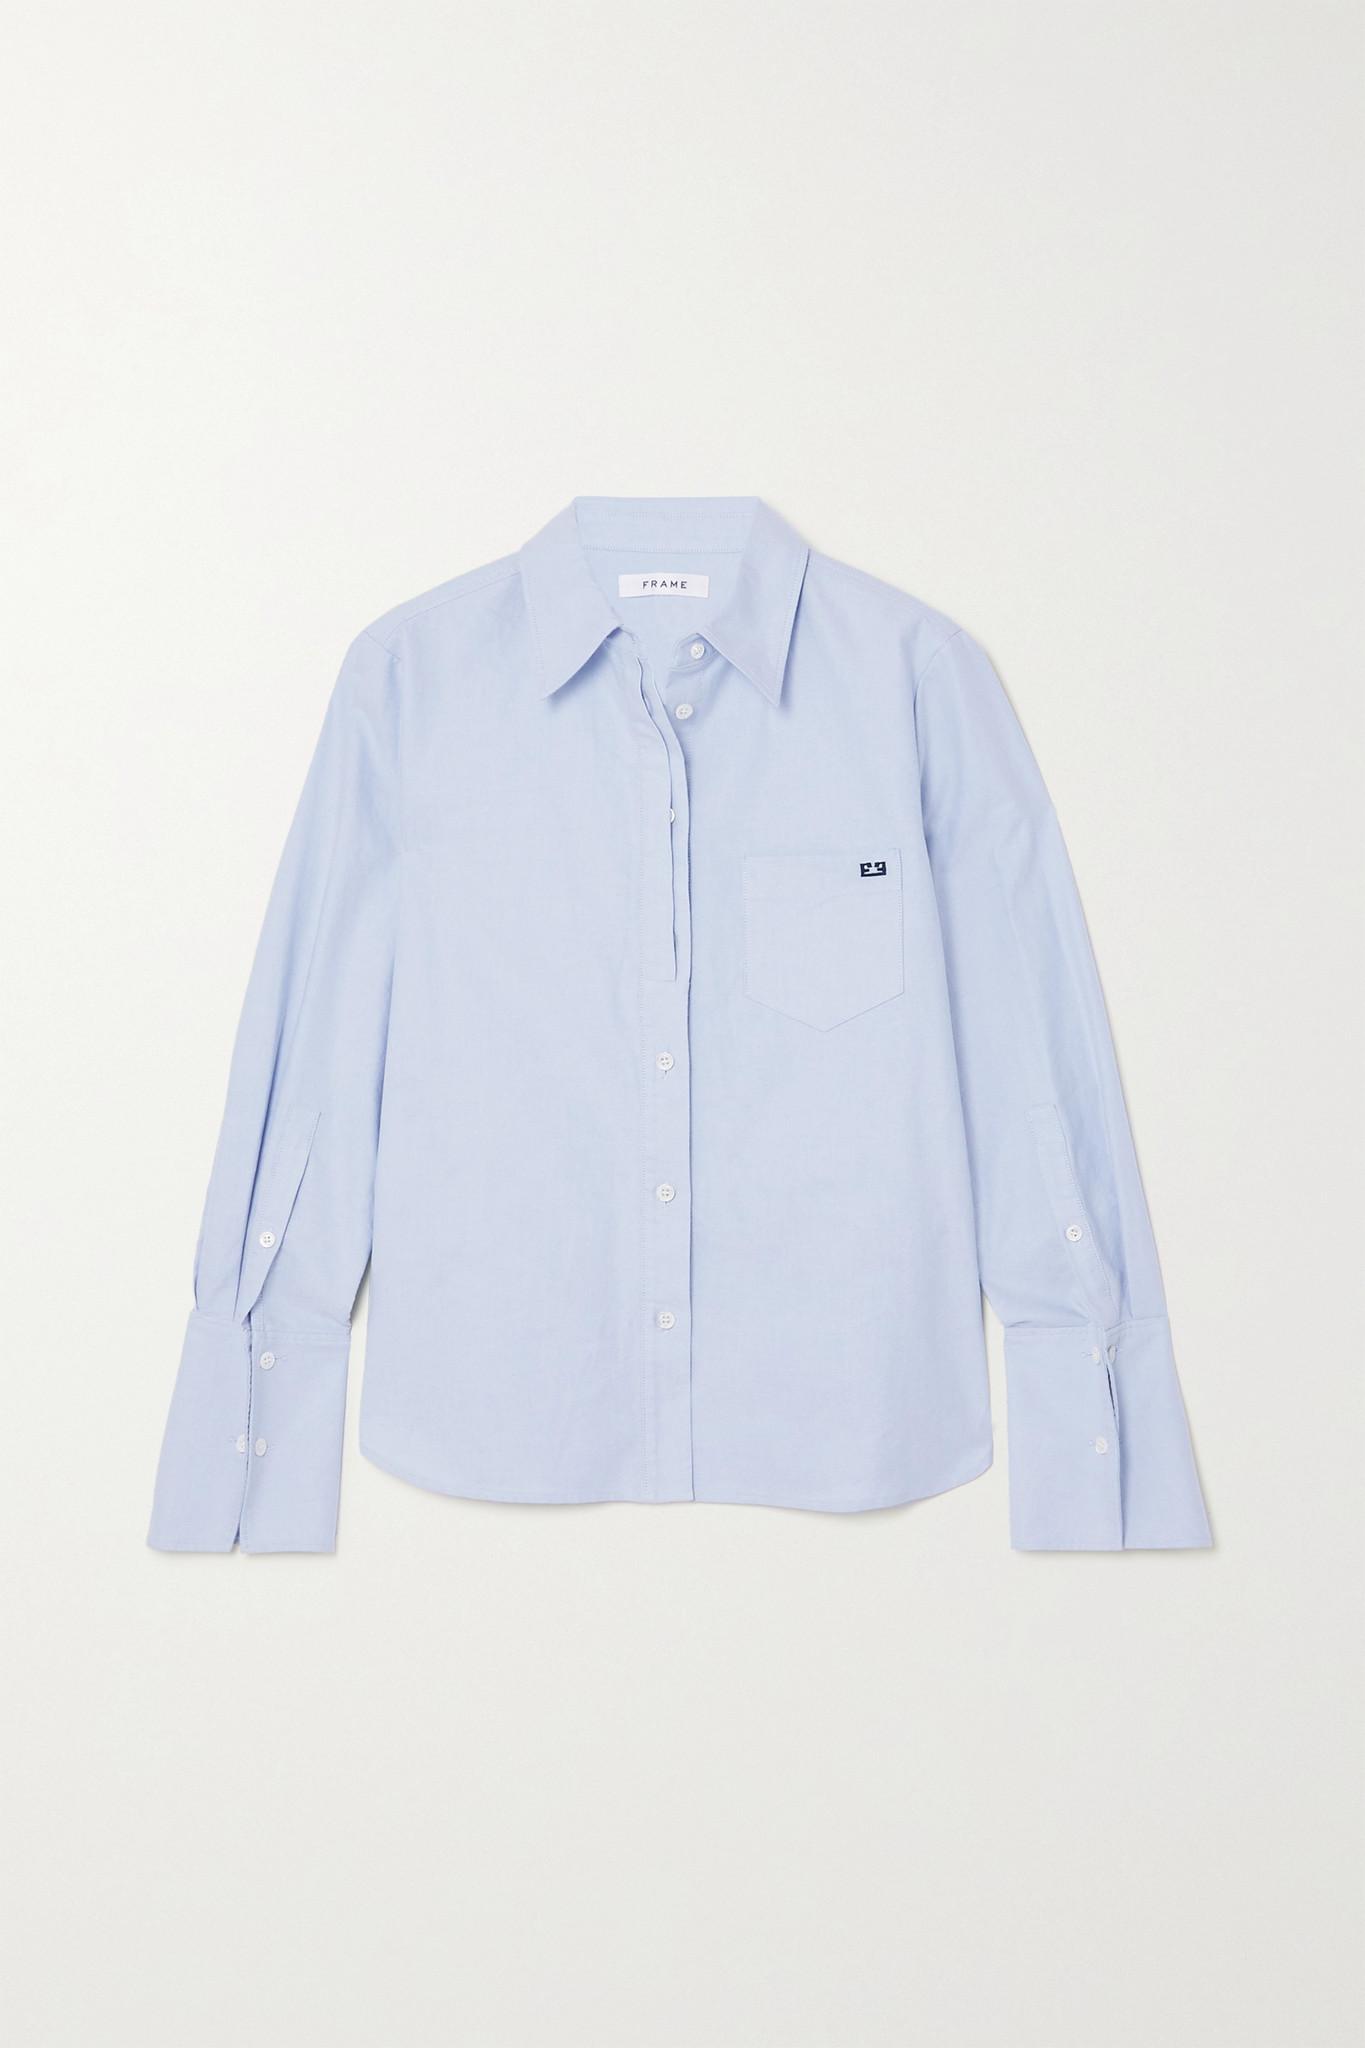 FRAME - 纯棉牛津纺衬衫 - 蓝色 - x small